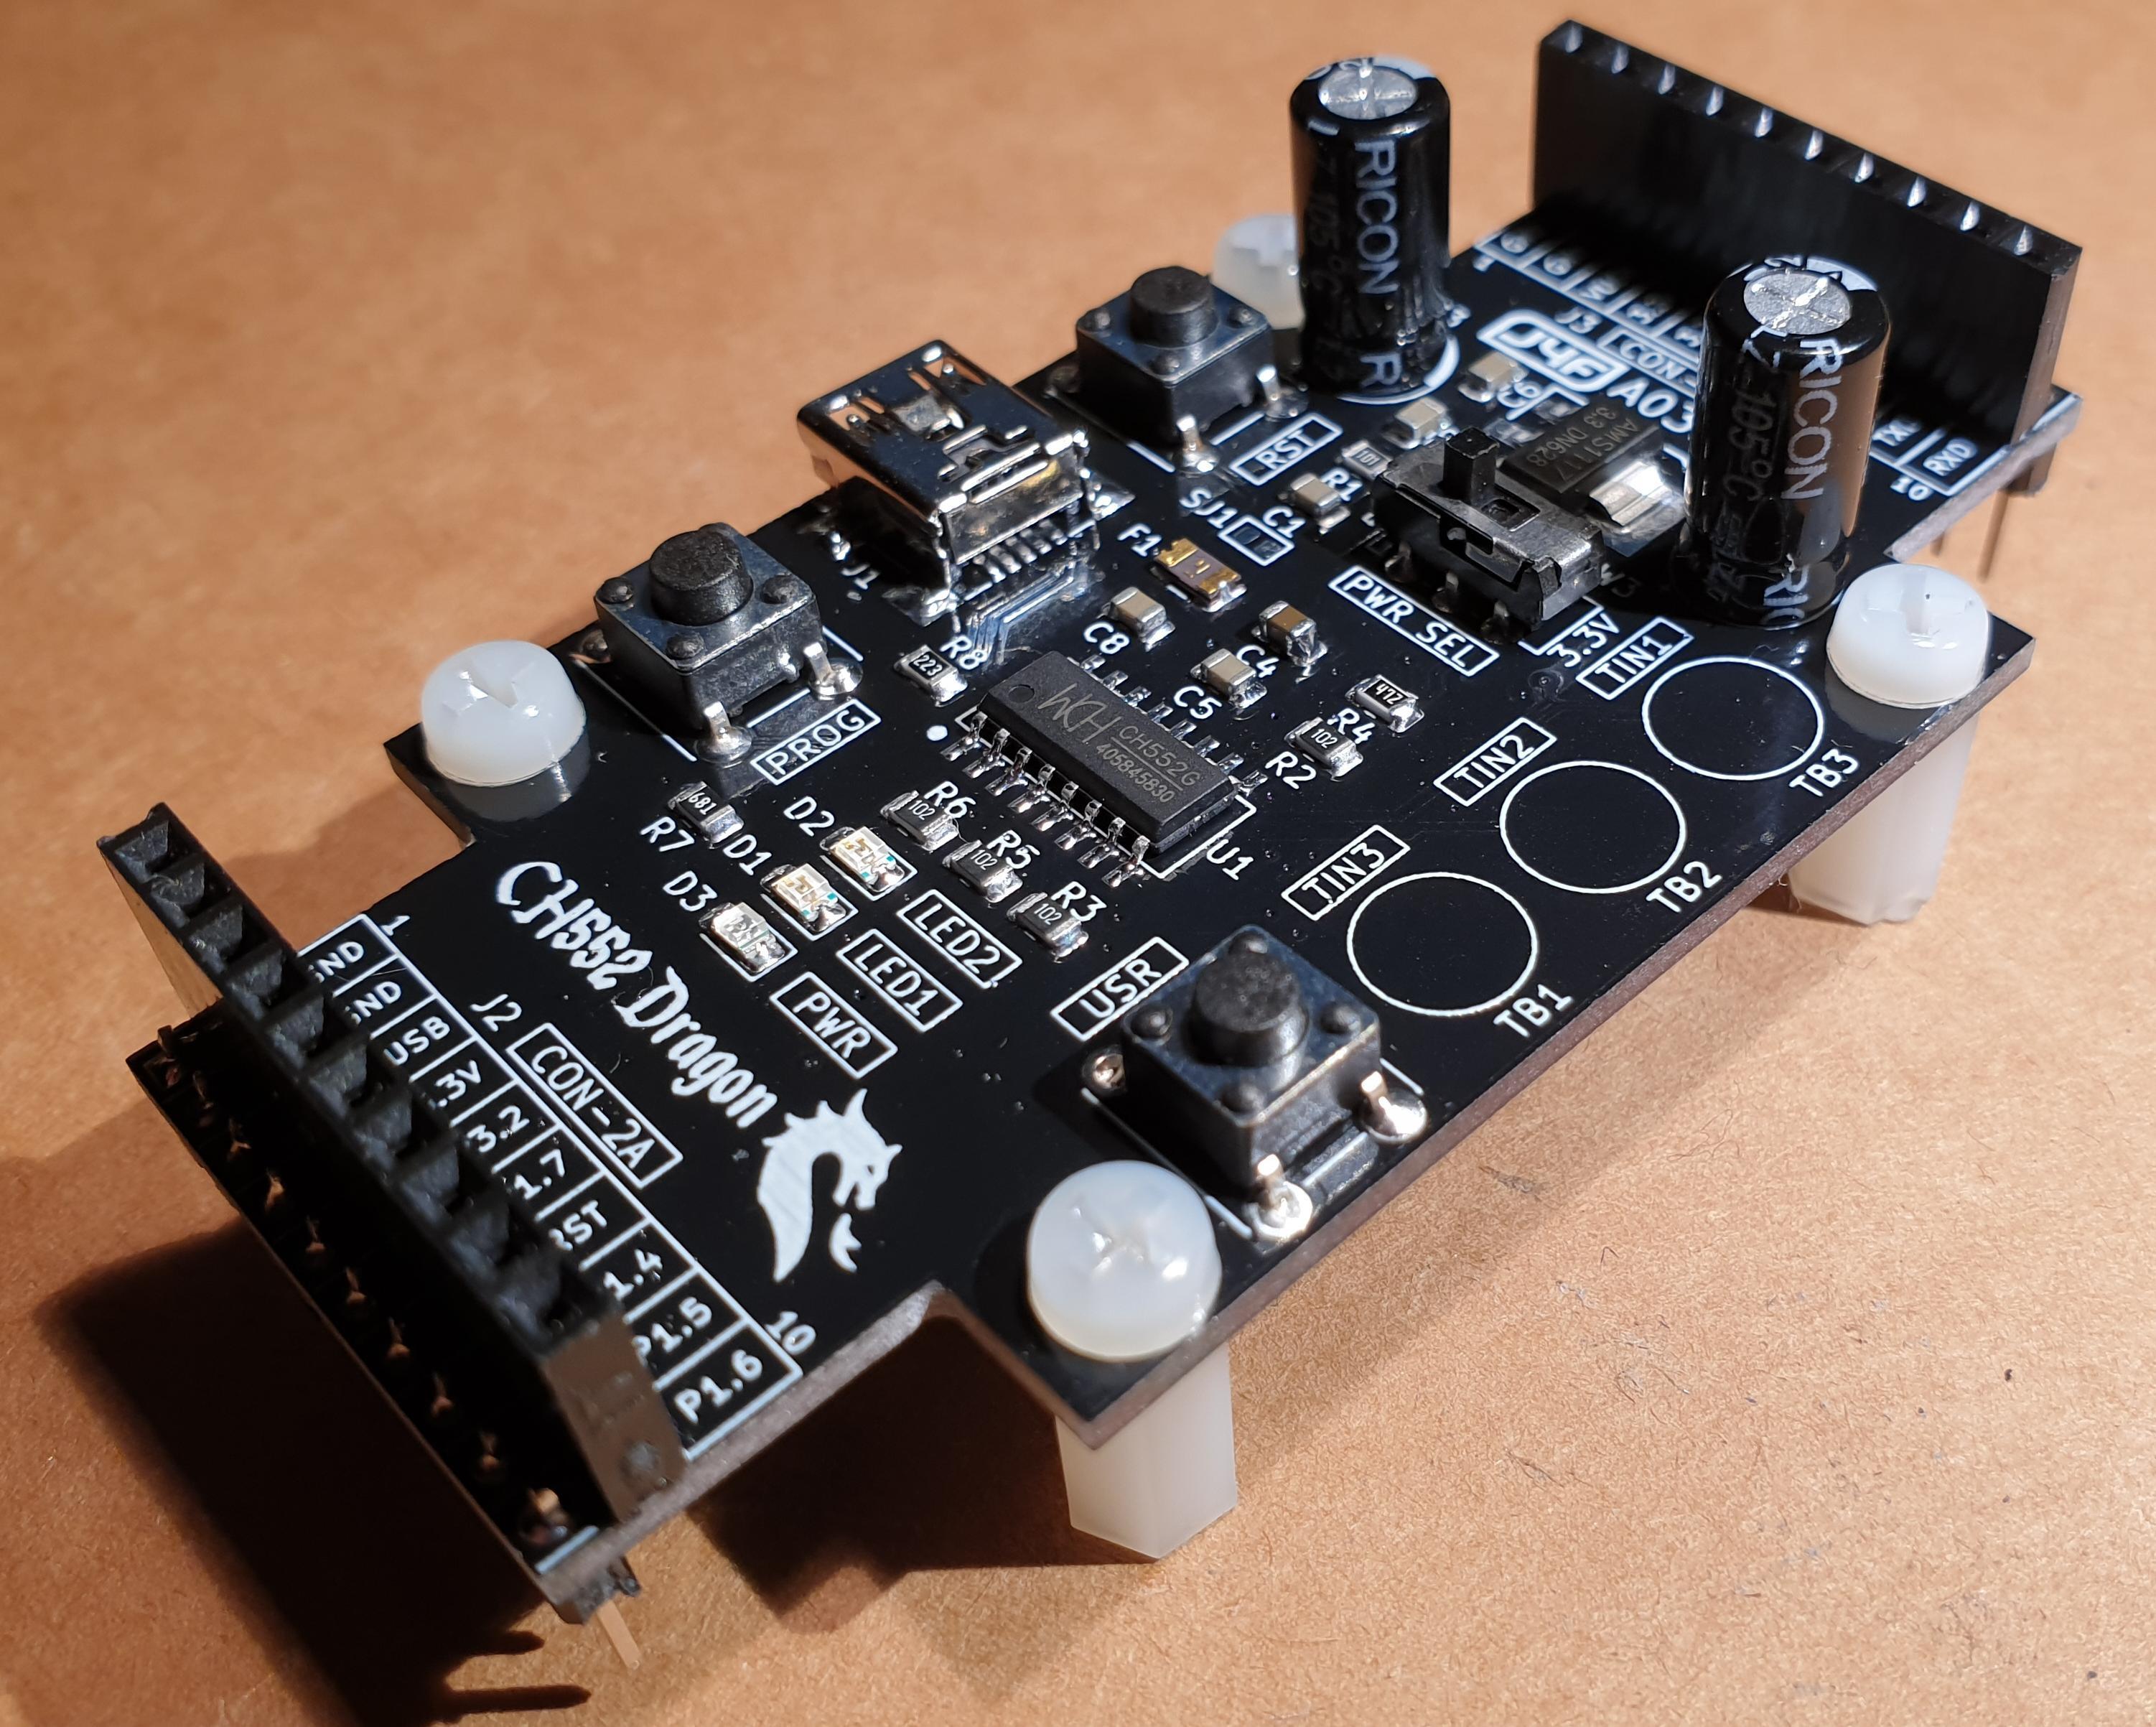 ricon circuit board wiring diagram ch552 dragon share project pcbway  ch552 dragon share project pcbway